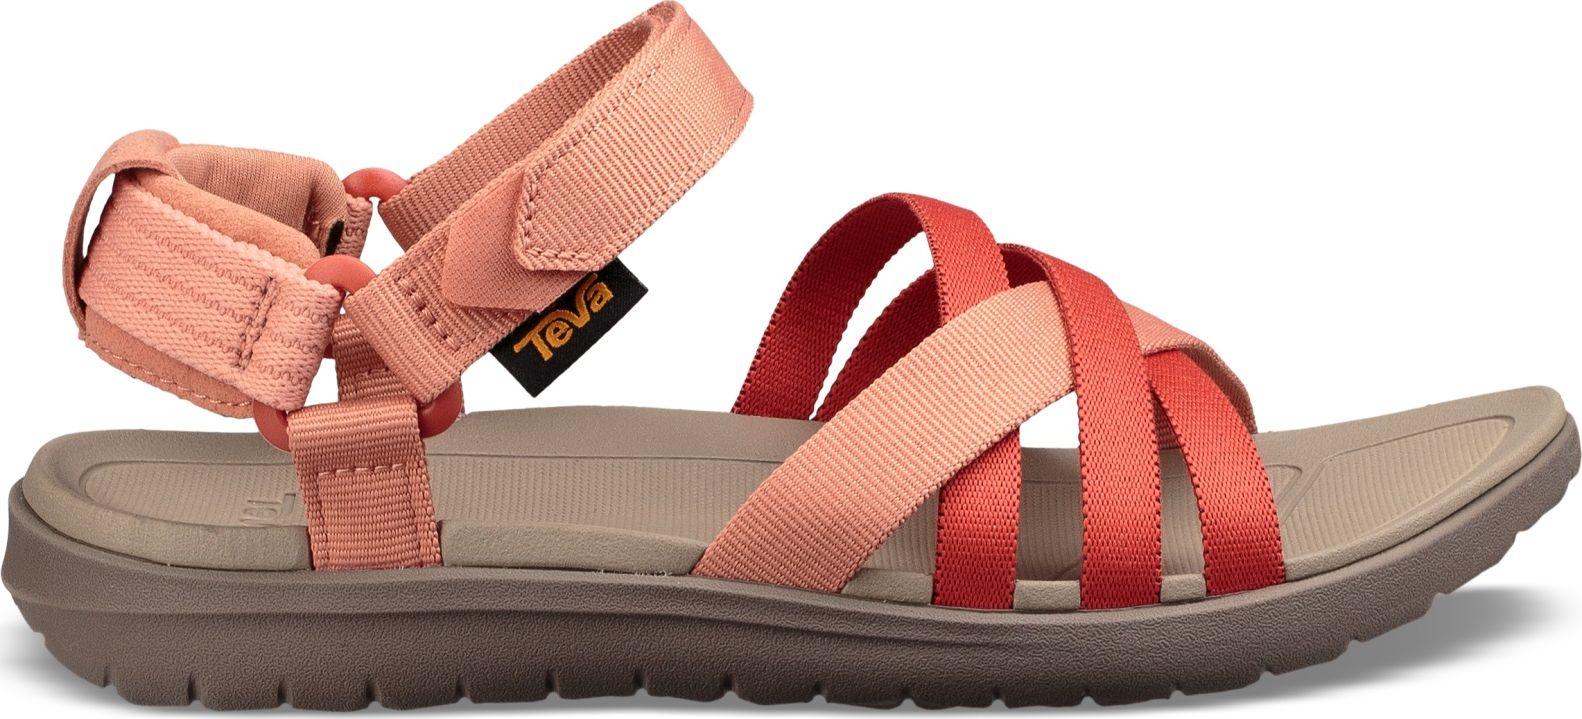 Teva Sanborn Sandal Coral Sand 36